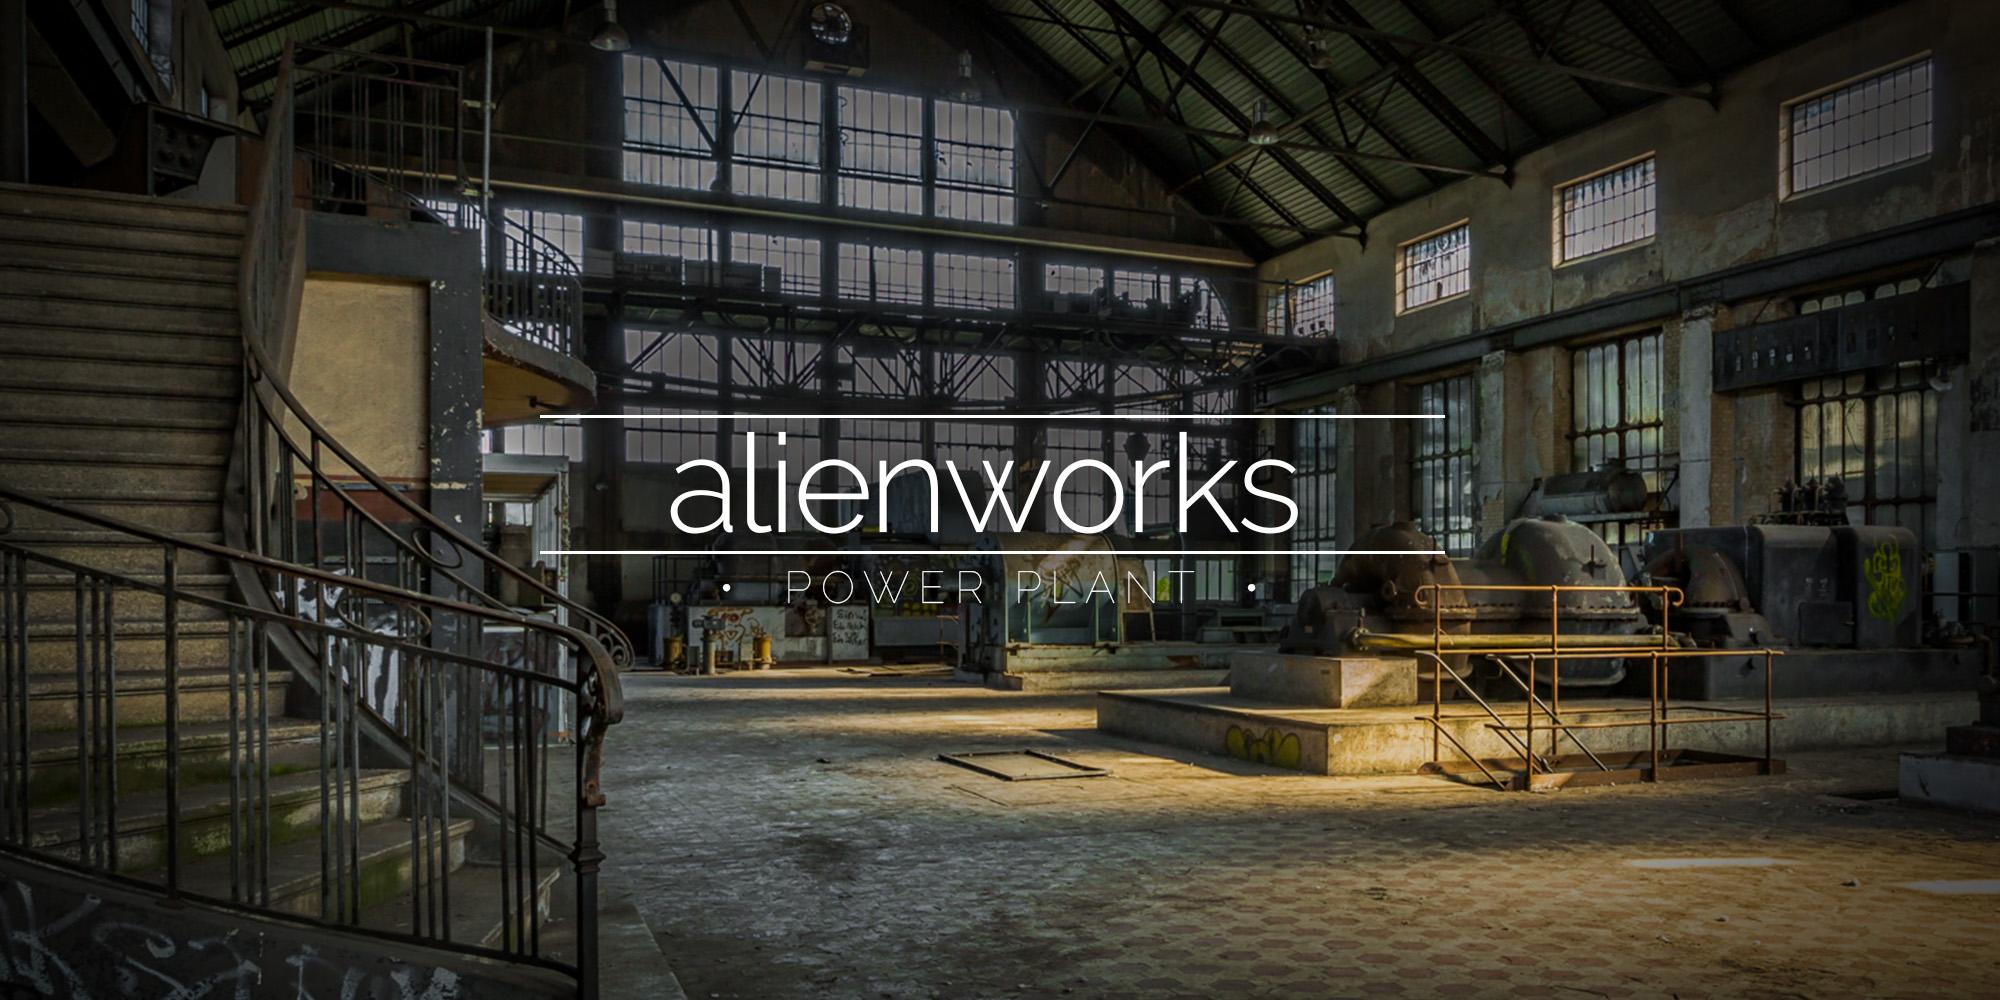 Alienworks Power Plant, Belgium